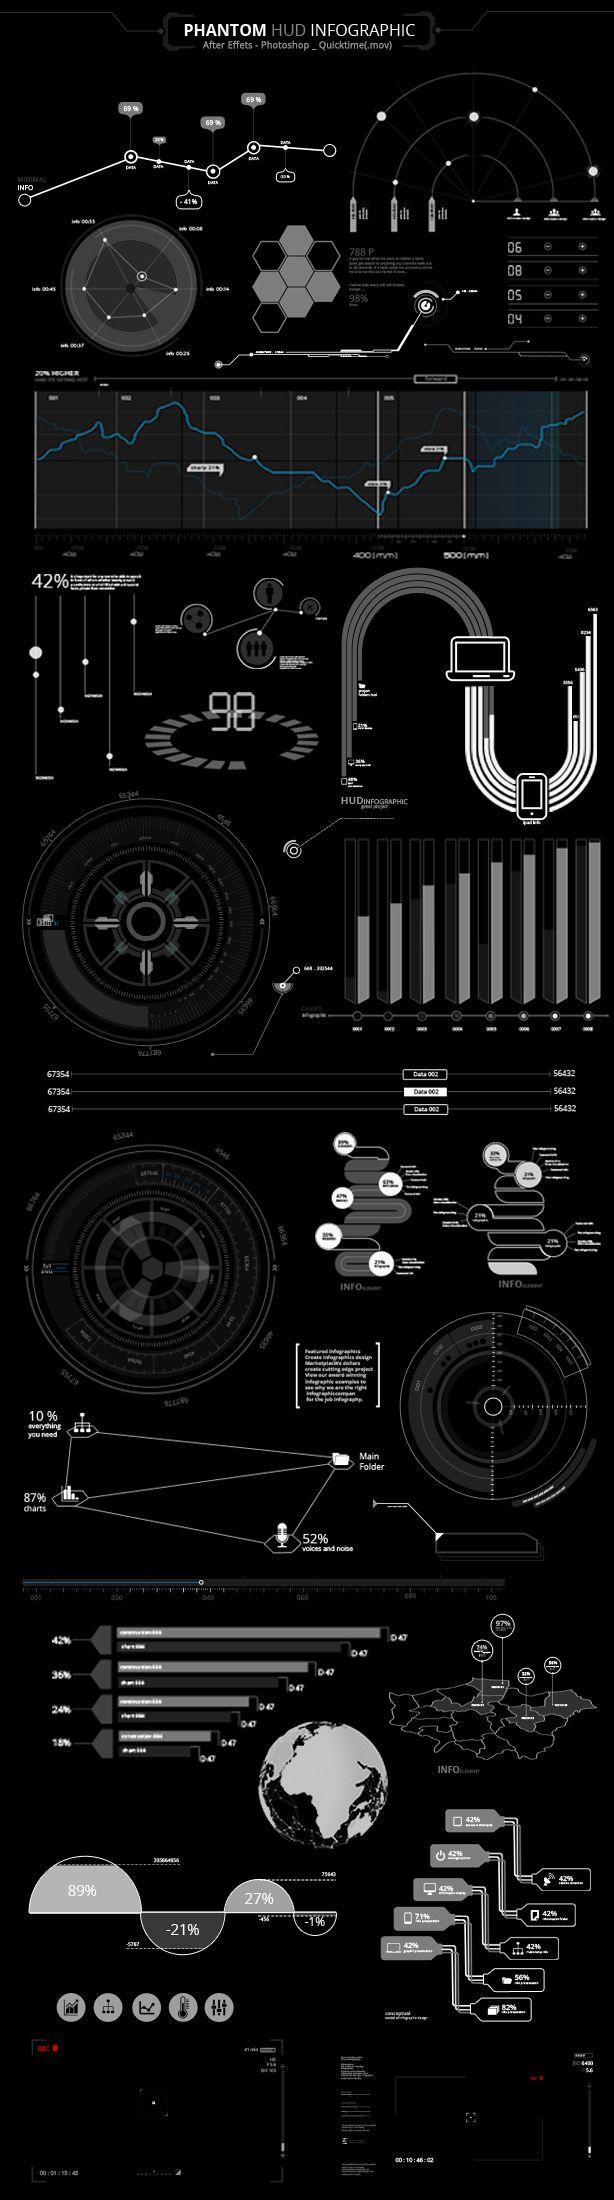 Motion Graphics - Phantom HUD Infographic